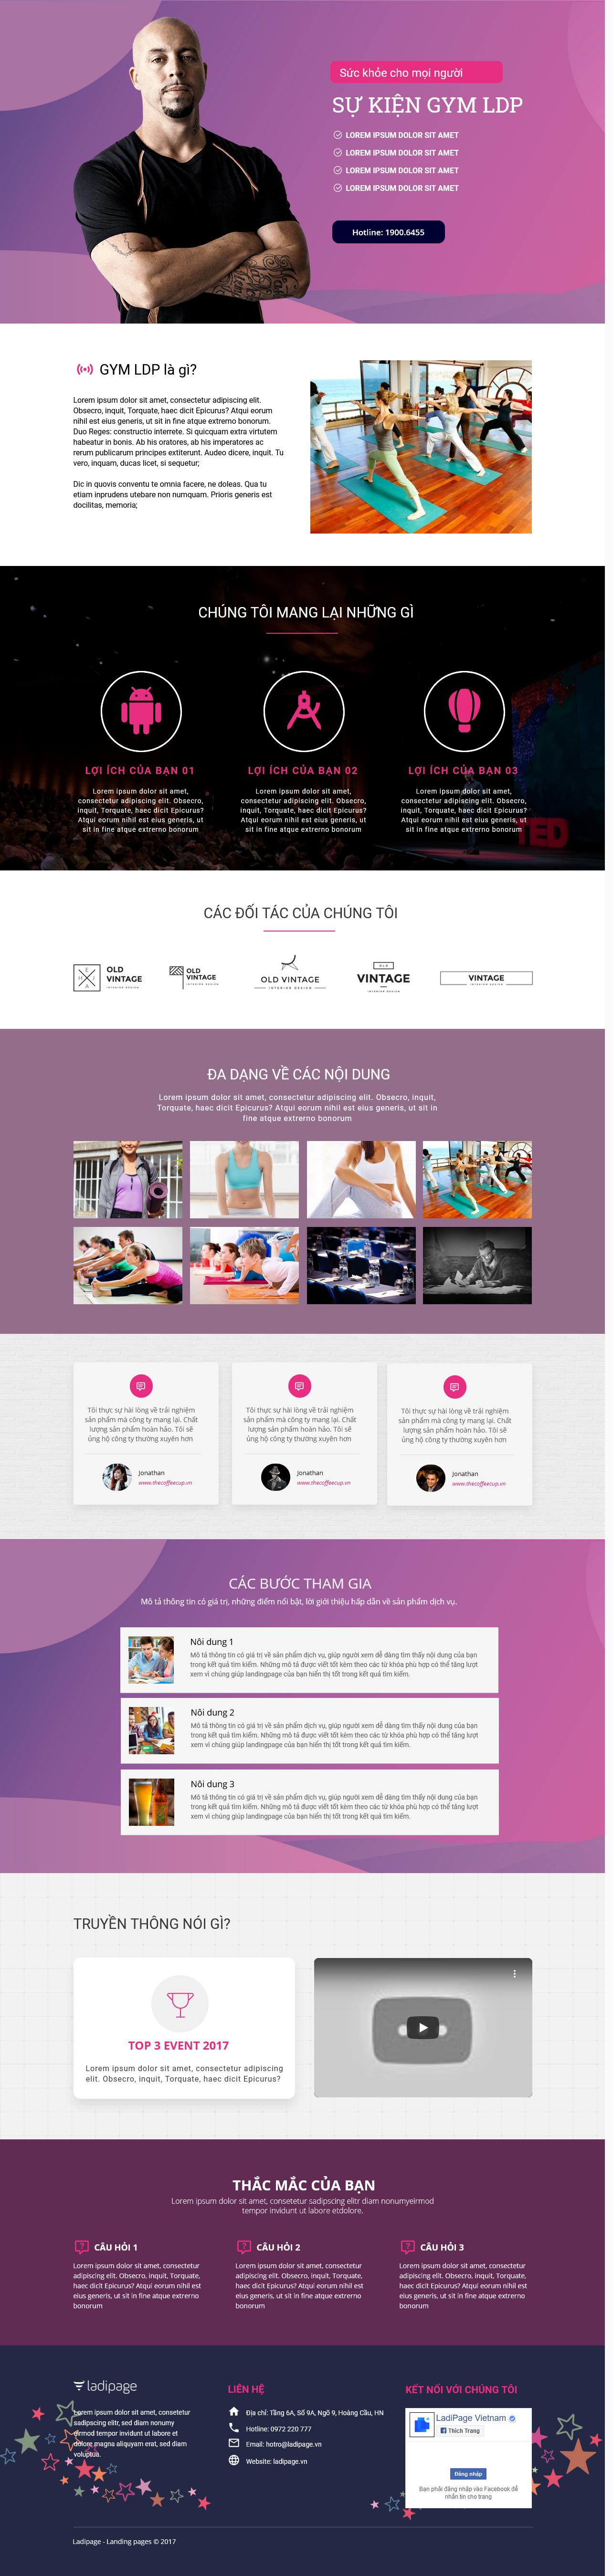 Thiết kế website Thiết kế webiste landingpage su-kien---hoi-thao Sự kiện 21